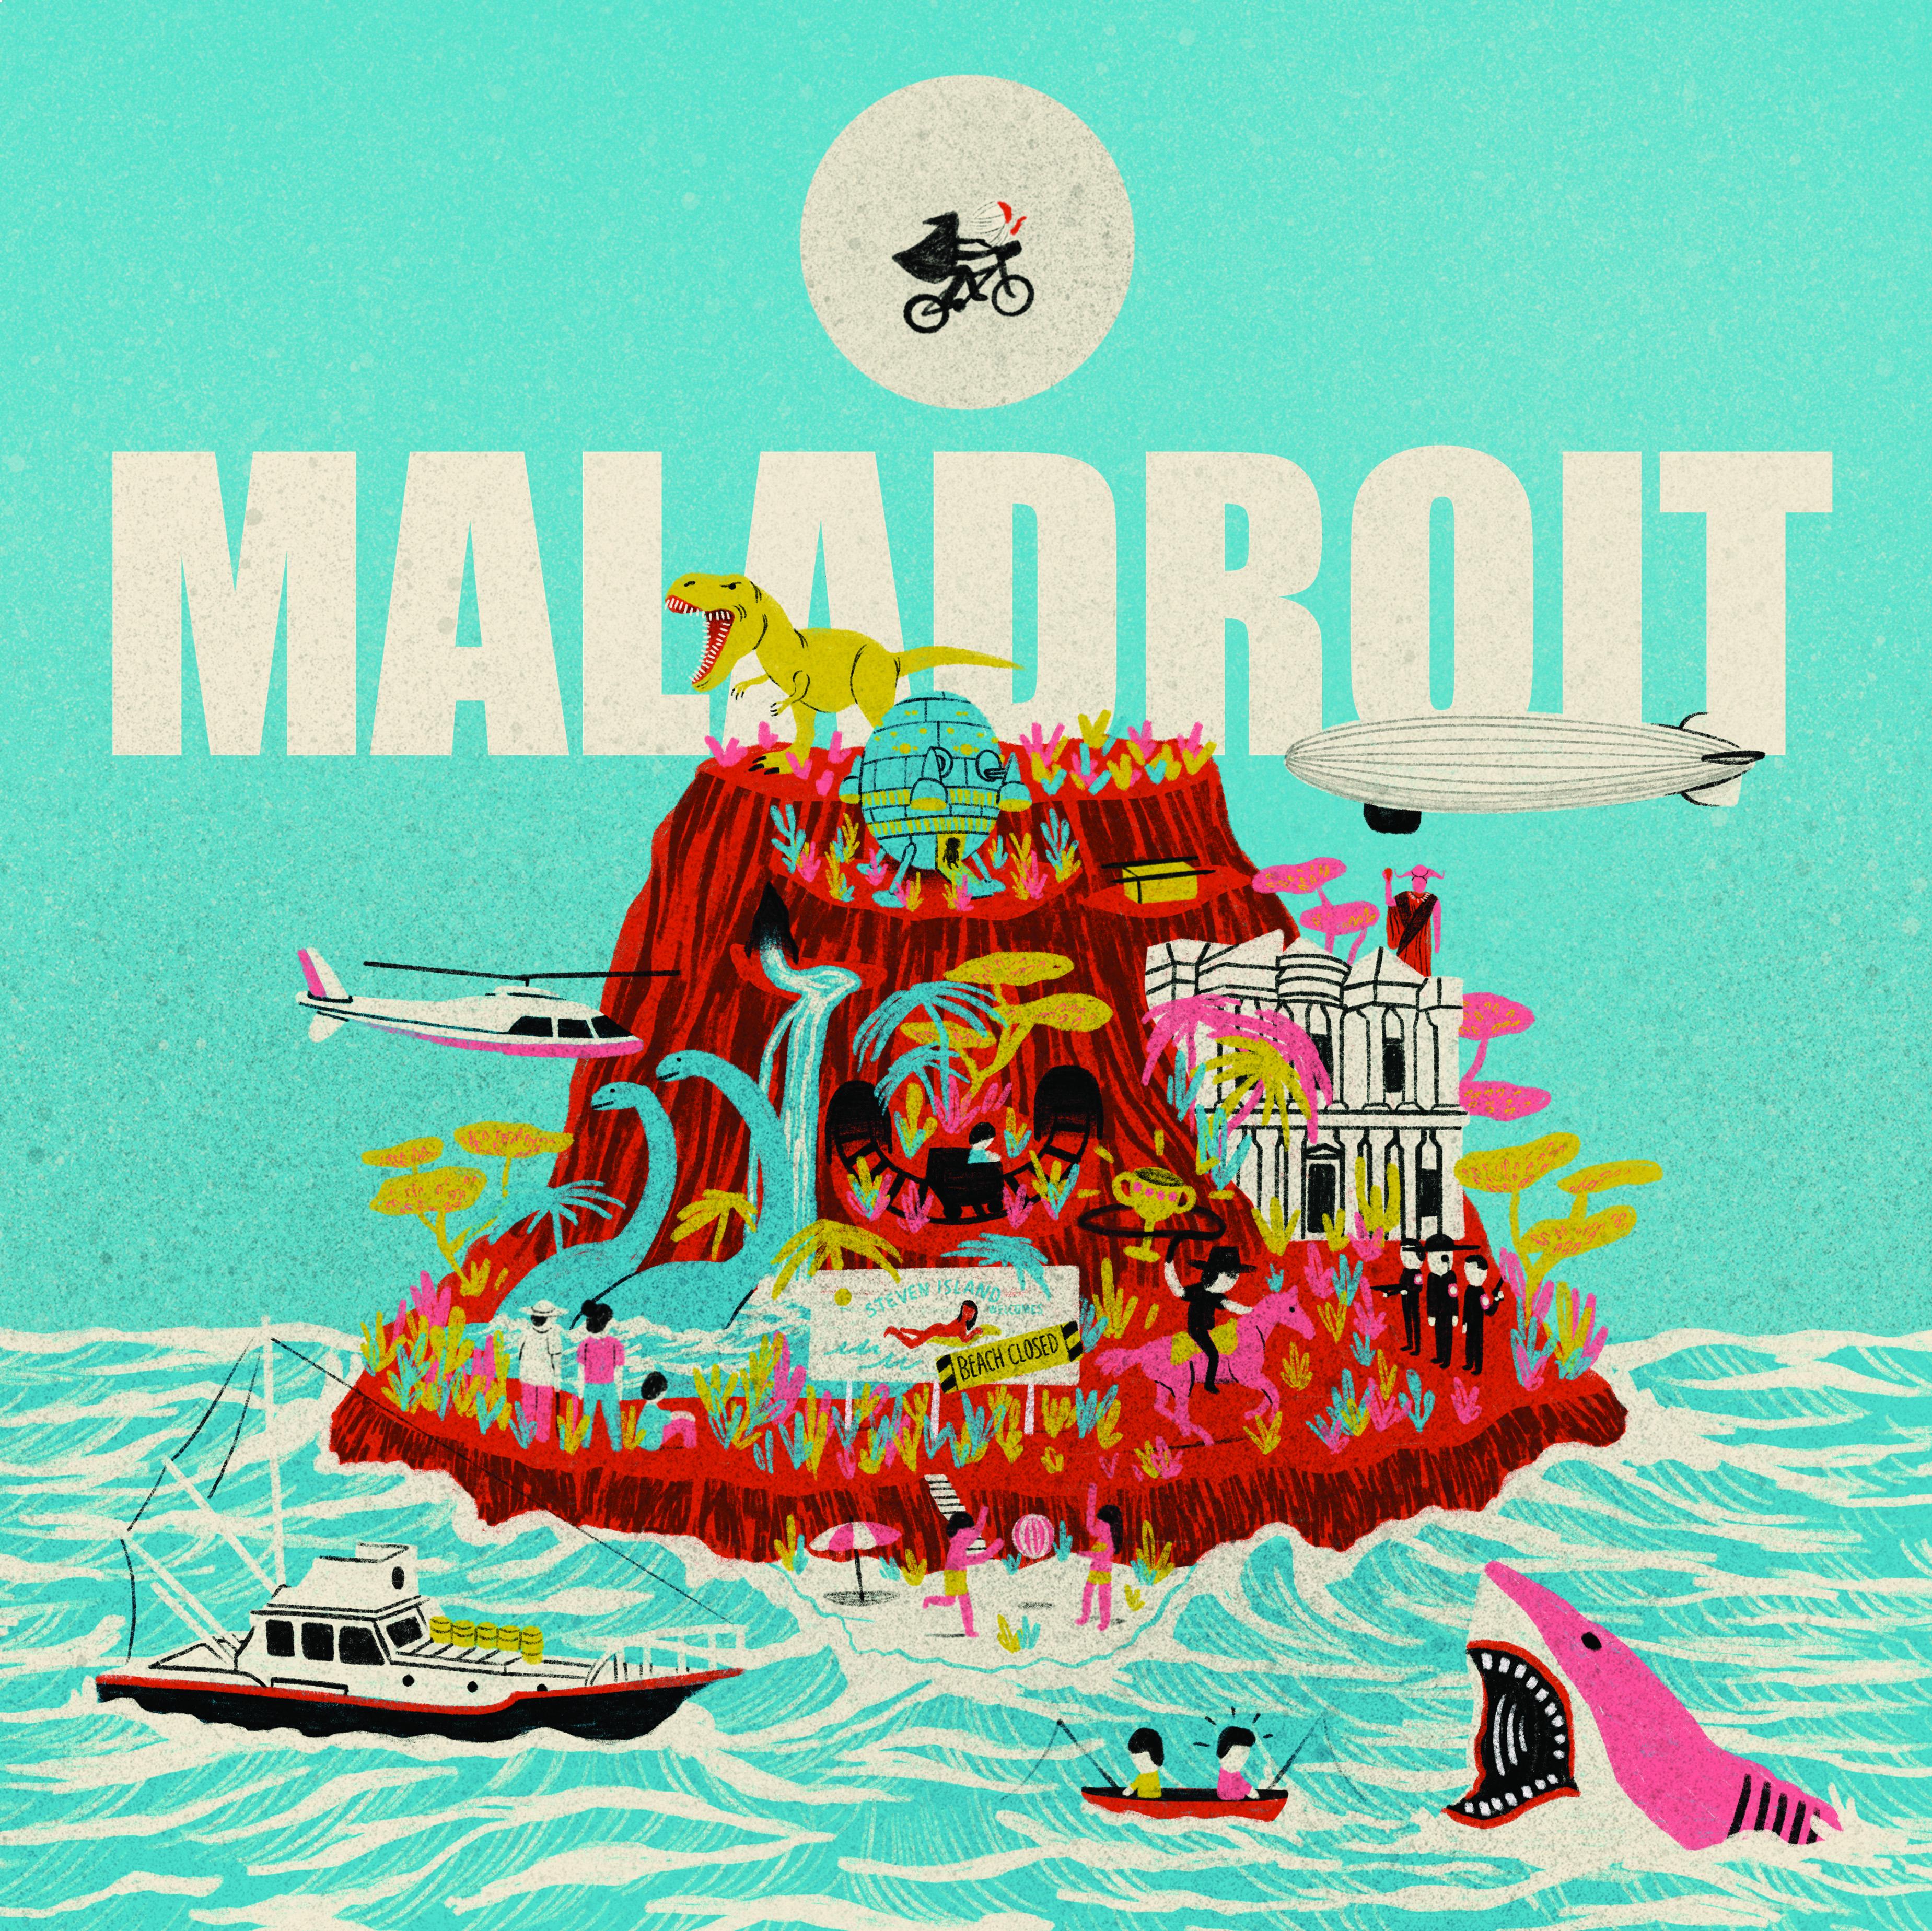 Maladroit - Steven Island